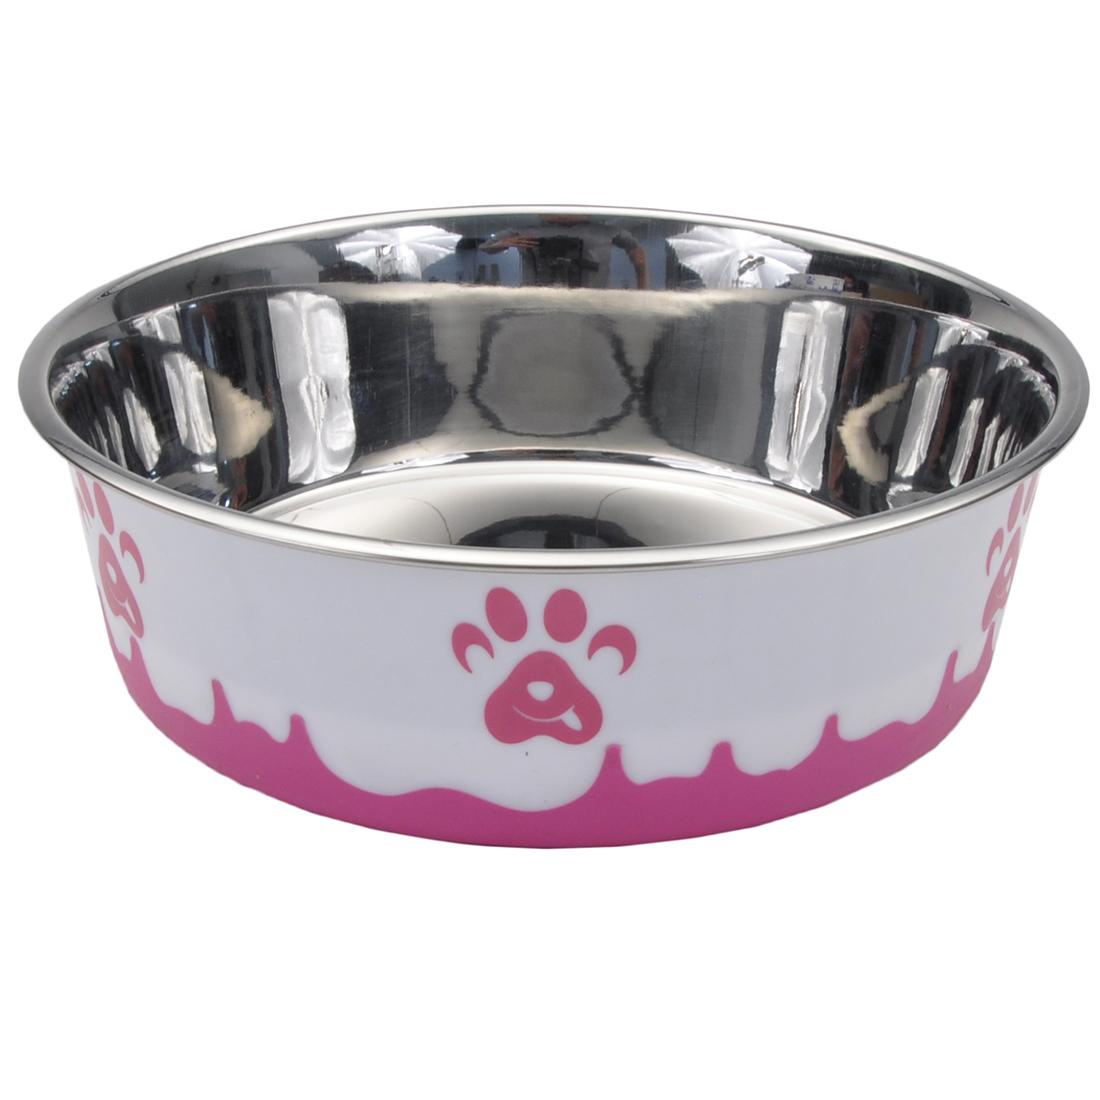 Coastal Pet Products 88420 P/W13